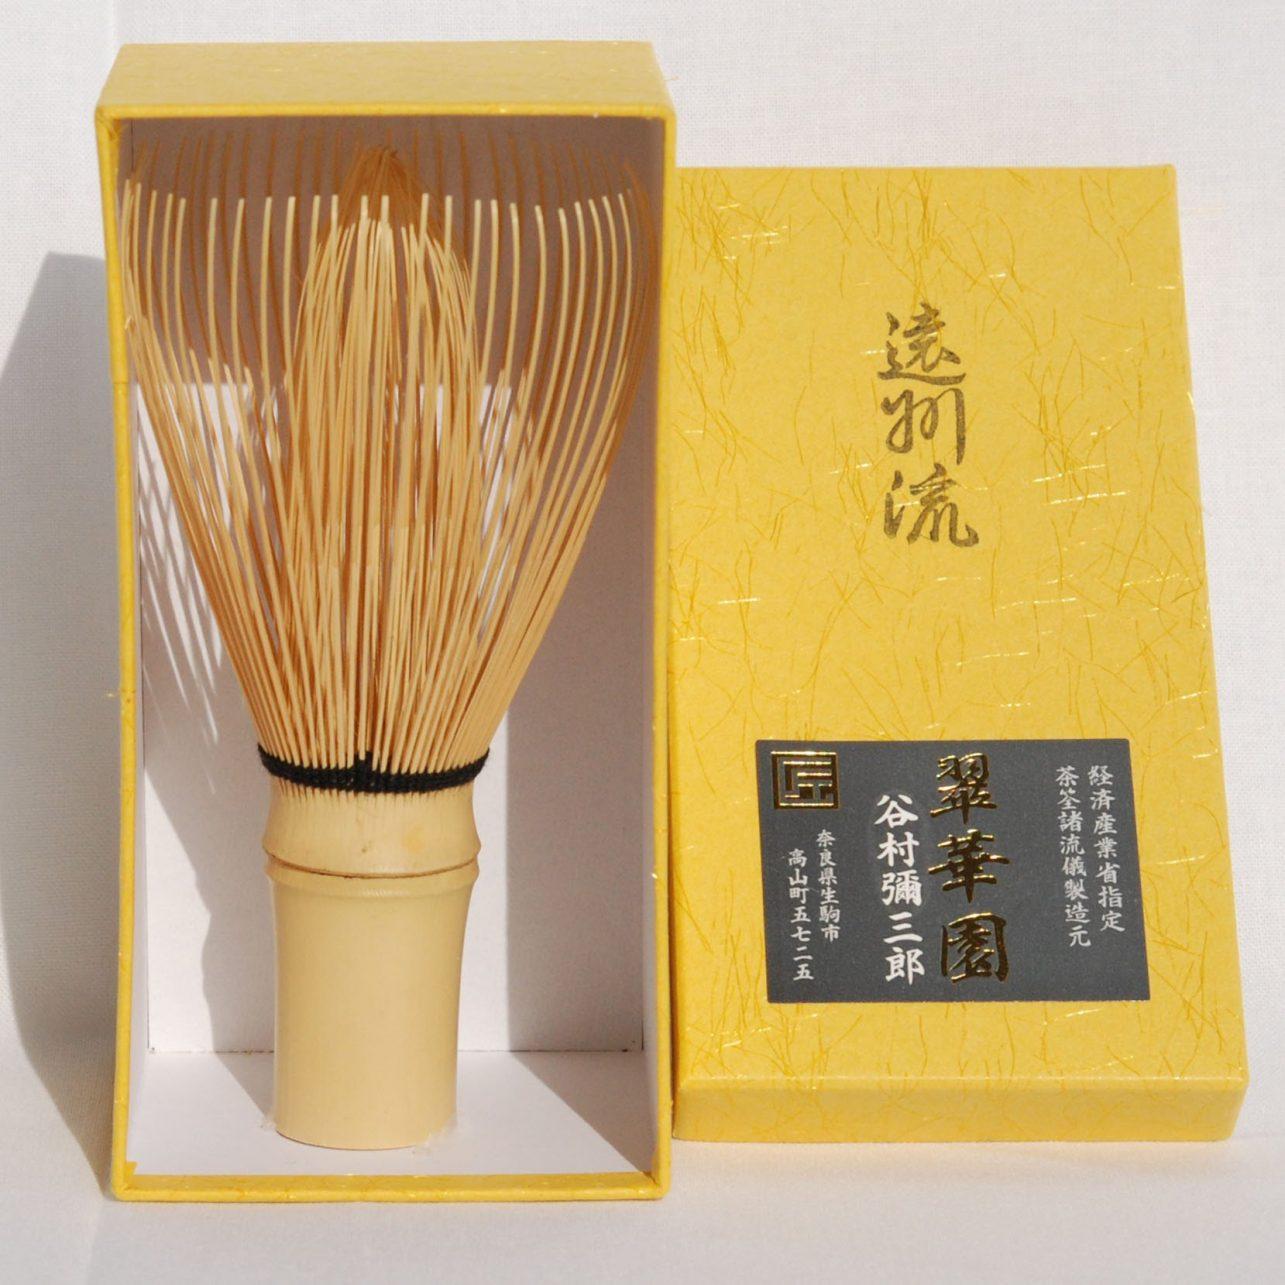 Enshu-ryu Tea Whisk for Thin Tea